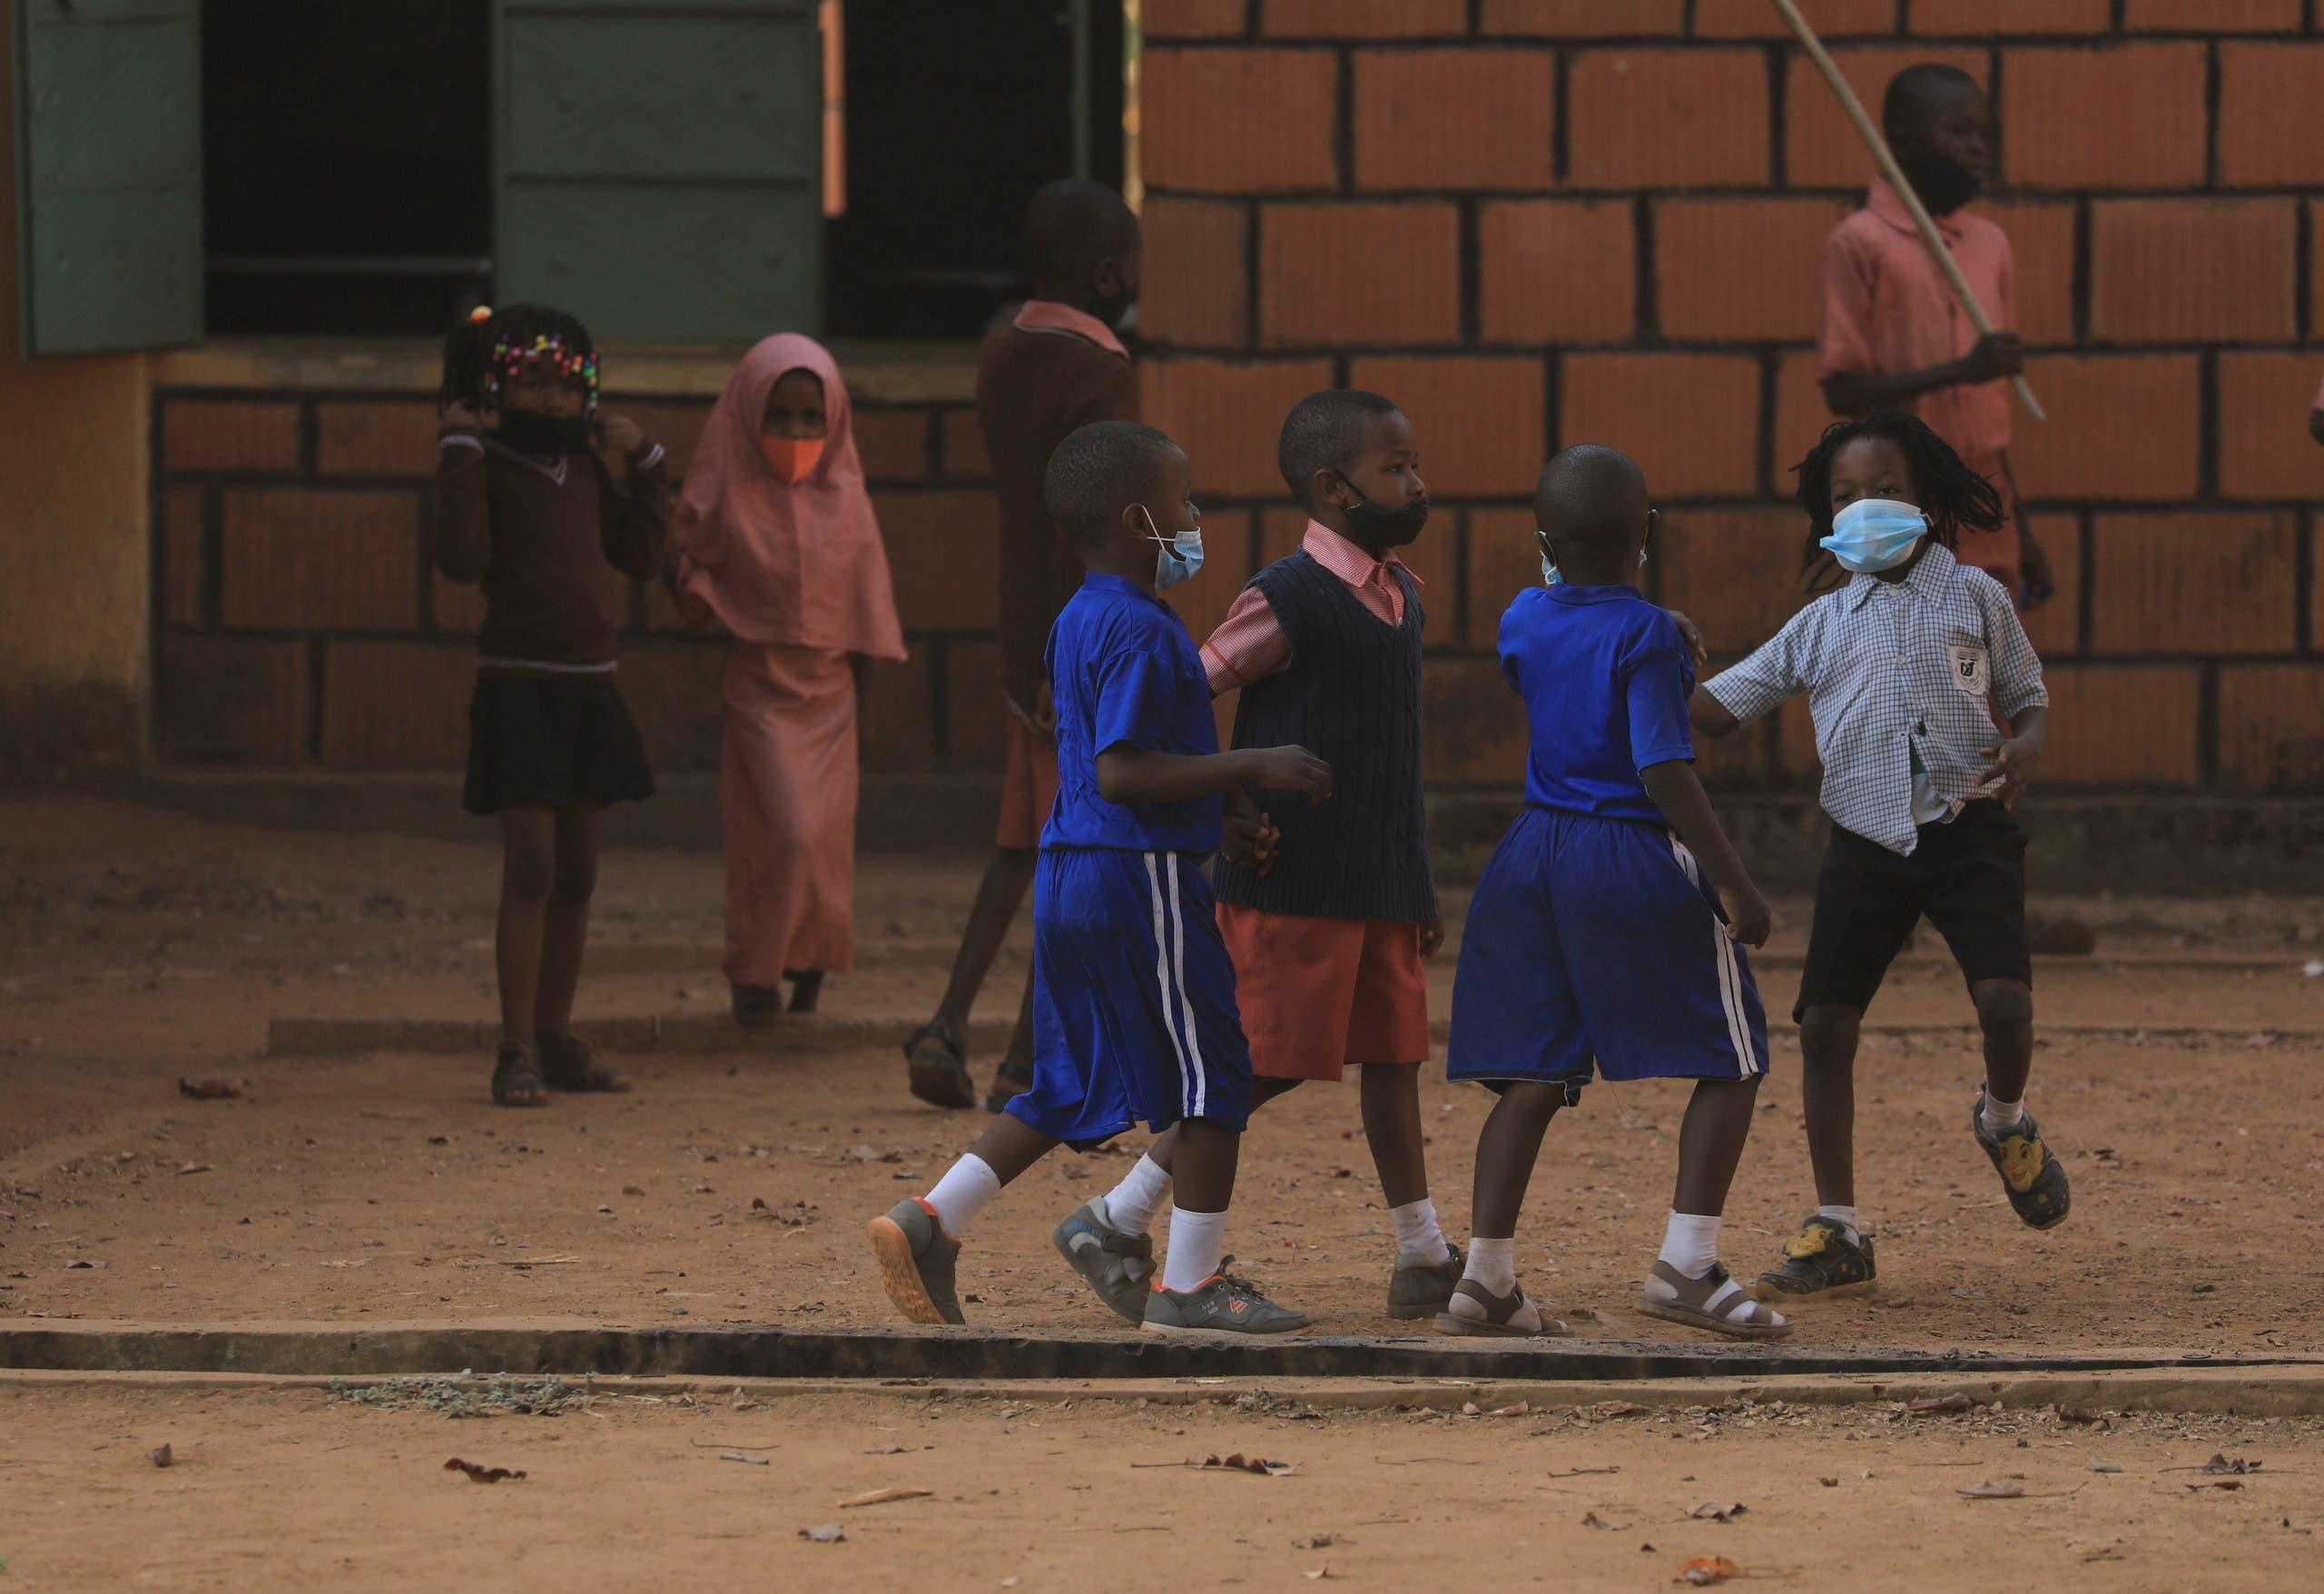 School children play outside as schools reopen in Nigeria amid the coronavirus-disease (COVID-19) outbreak, in Abuja, Nigeria January 18, 2021. (Reuters)